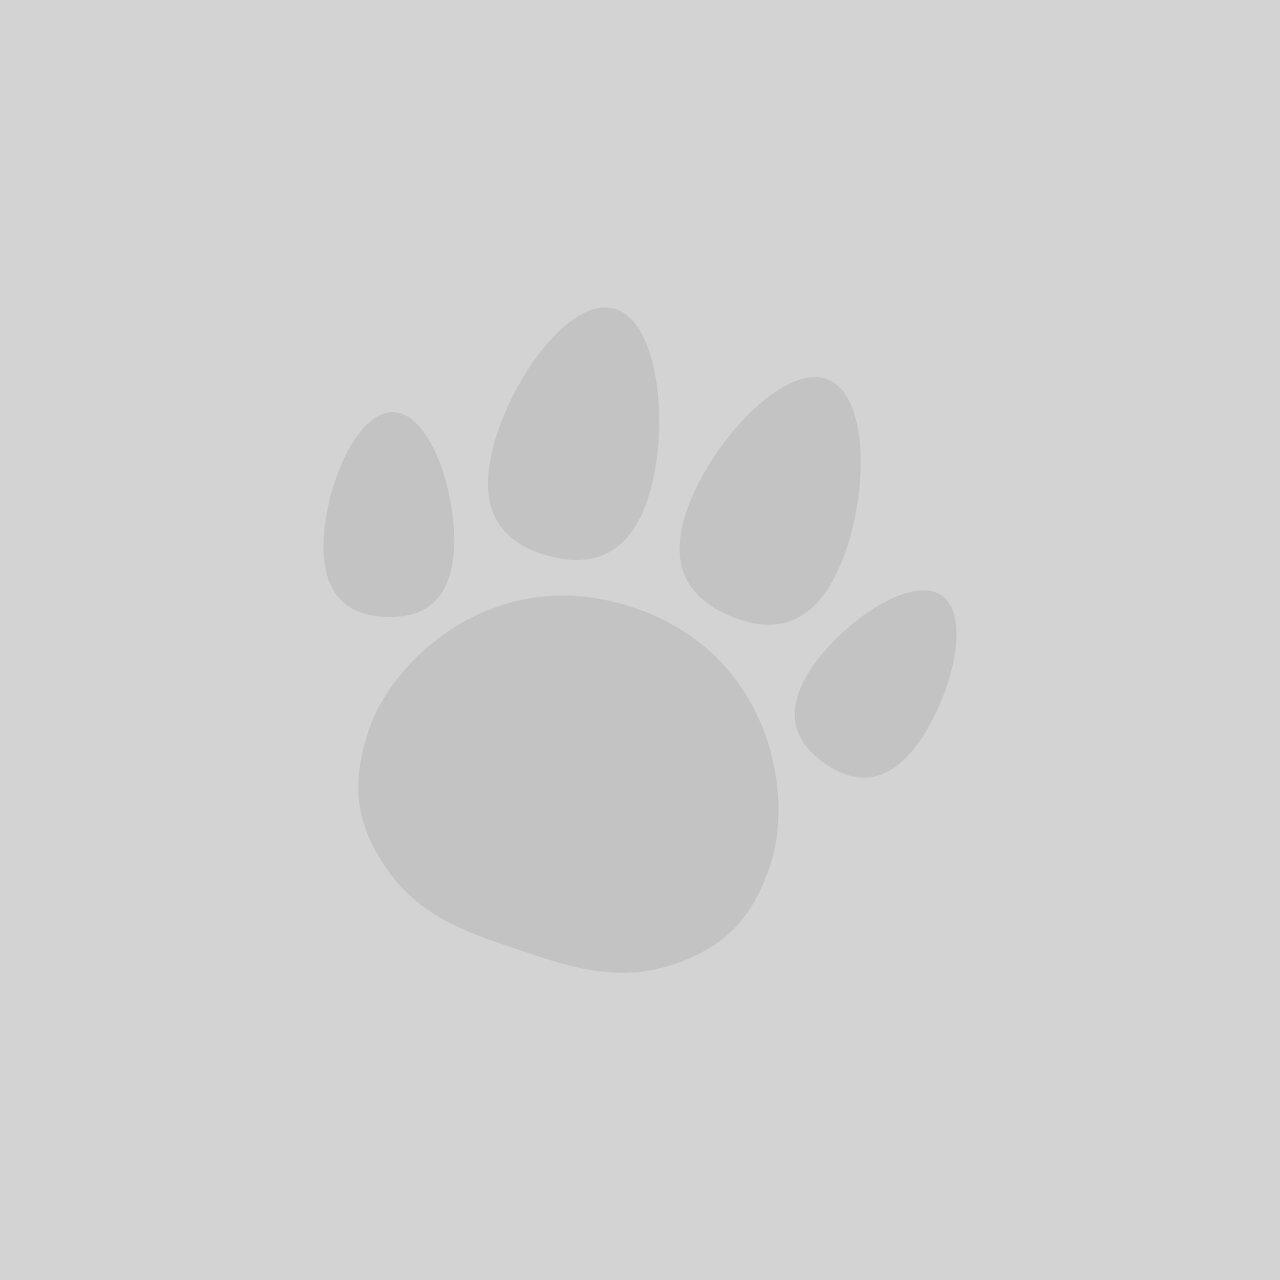 Fluval U2 Filter Media Poly/Clearmax Cartridge 2 pack